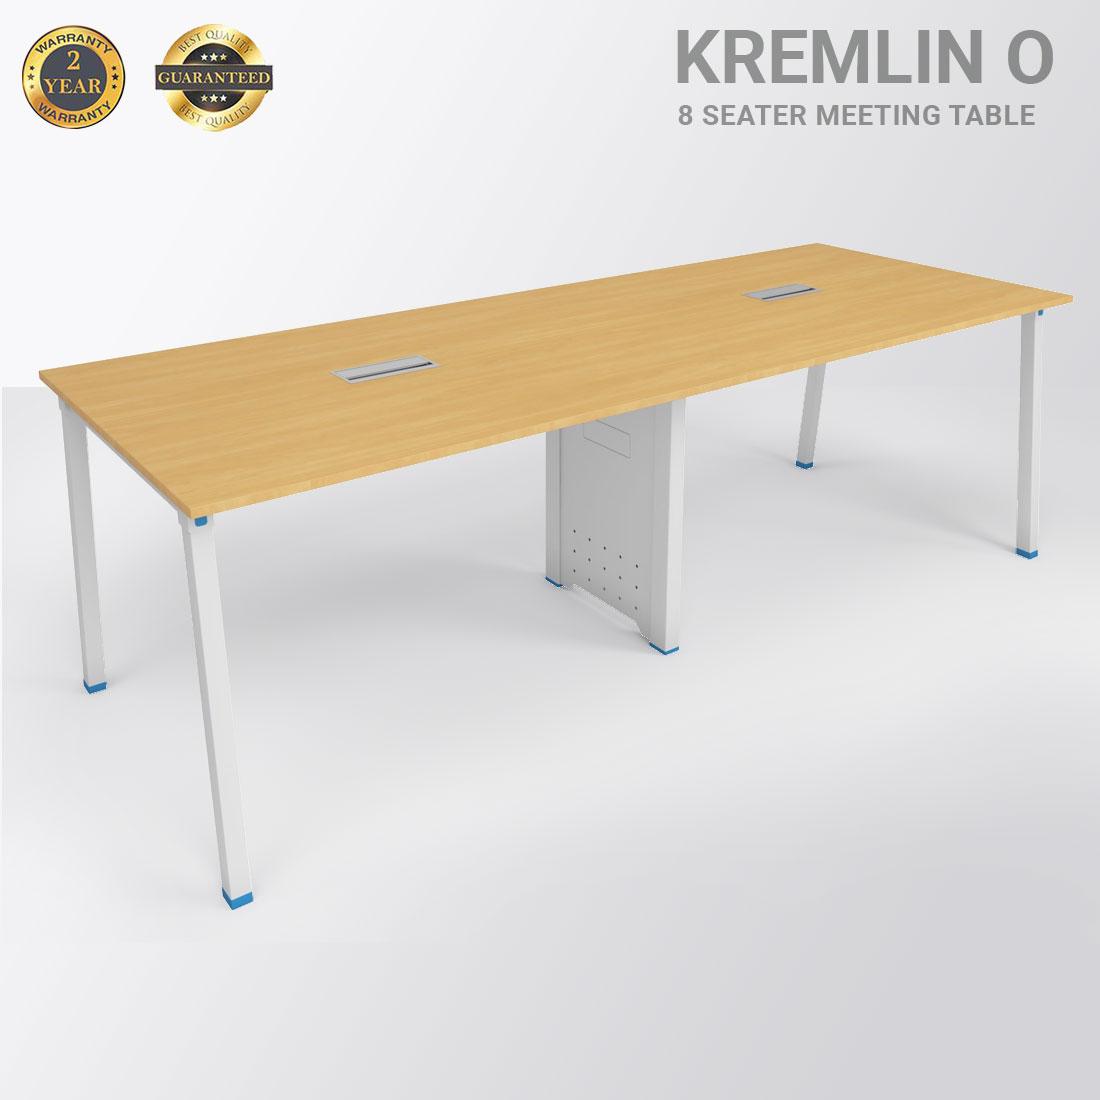 KREMLIN O 8 SEATER